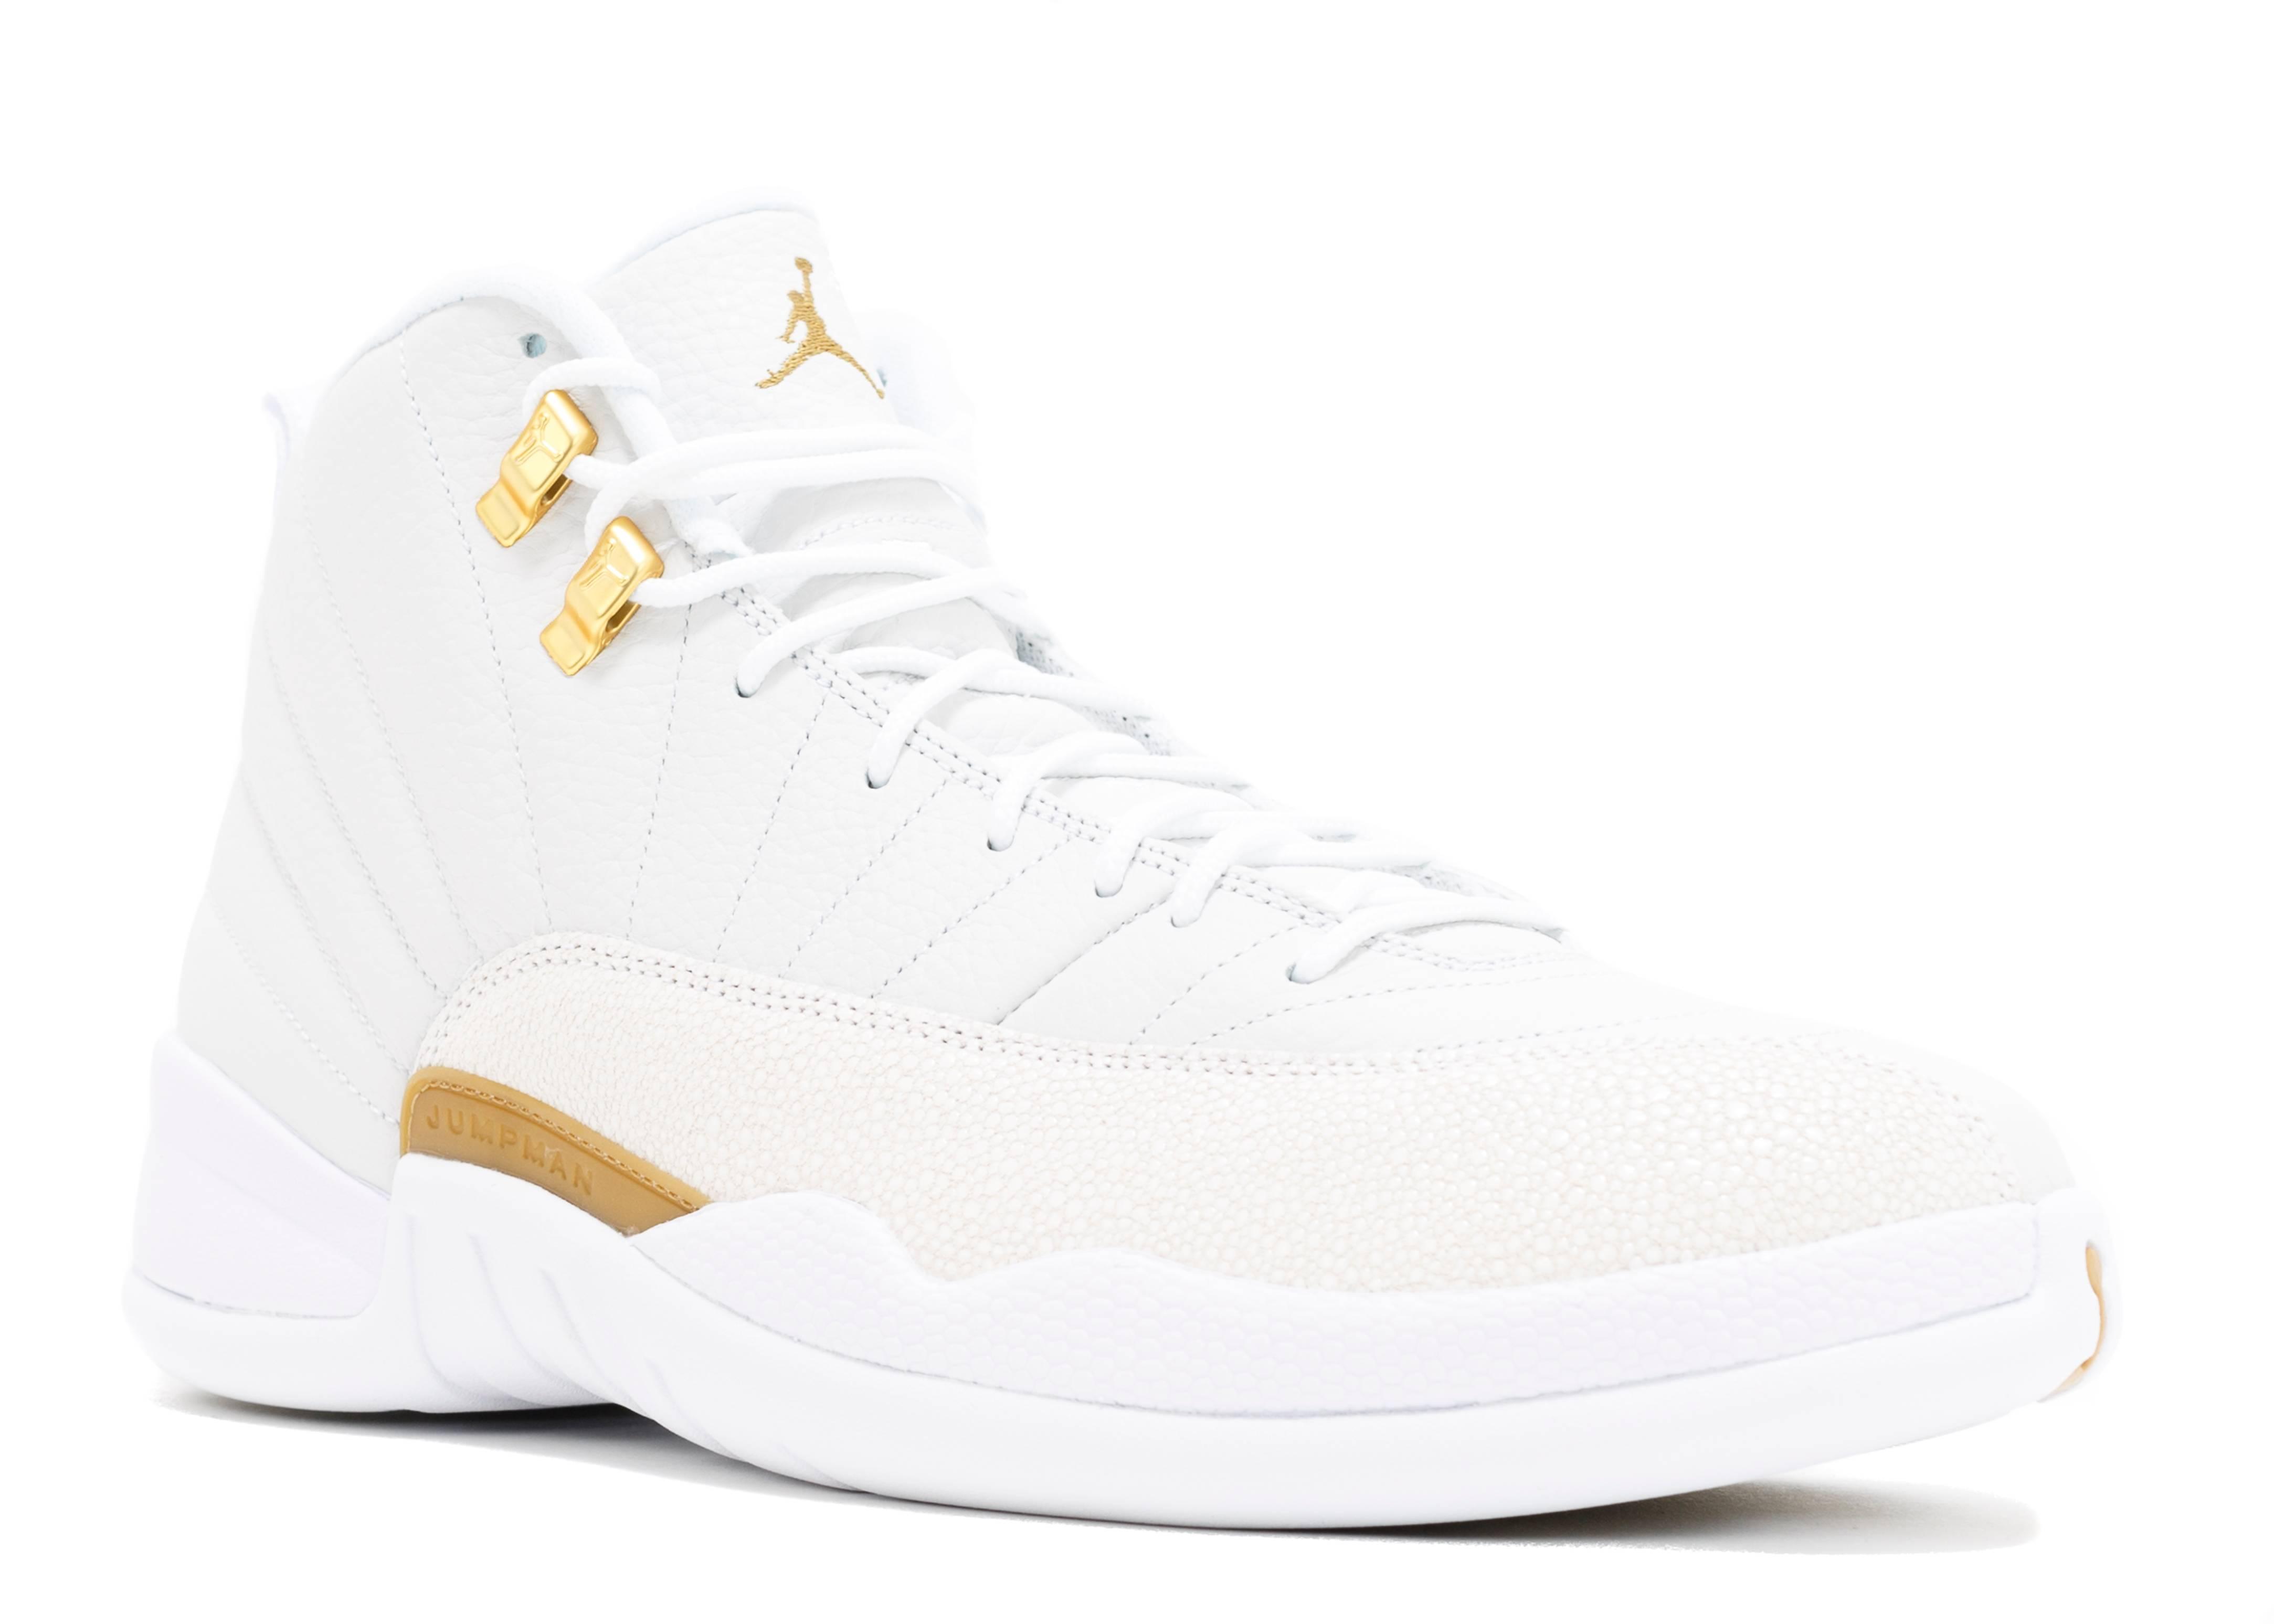 Air Jordan 12 Retro Ovo Quot Ovo Quot White Metallic Gold White